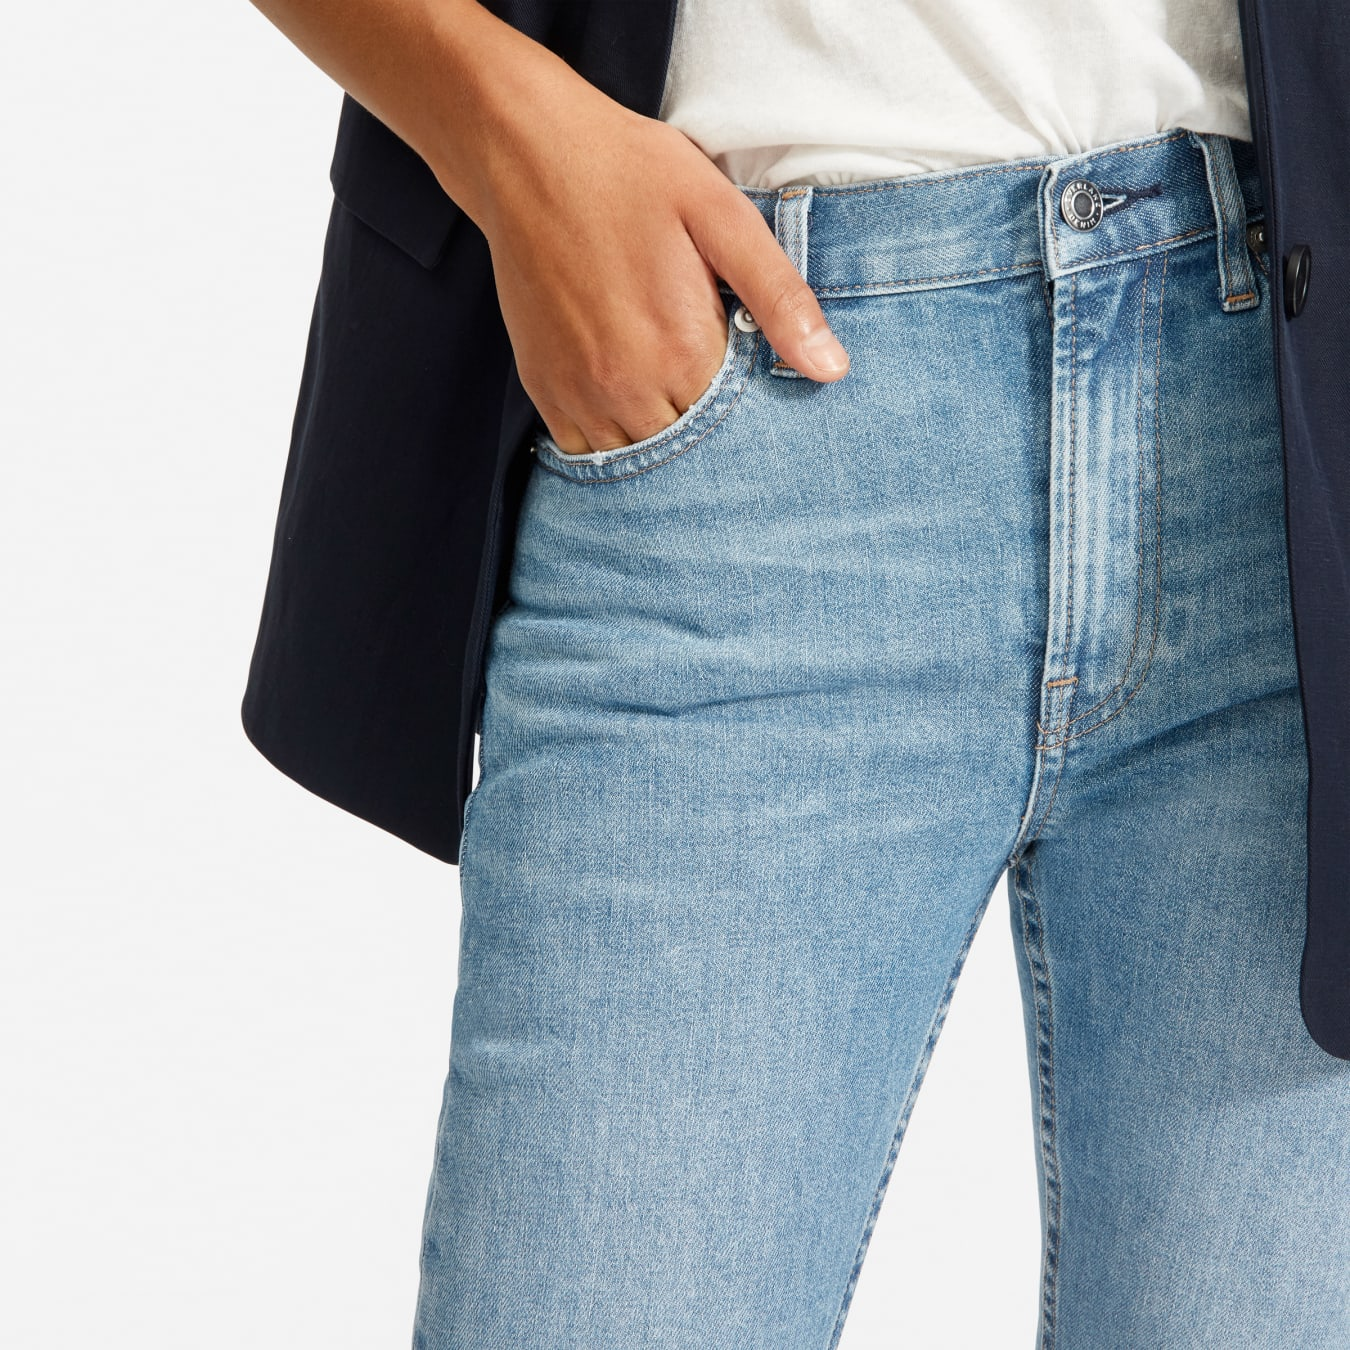 Ladies Dark Indigo Denim Stretch Cotton Kickflare Jean Sz 10 Medium New